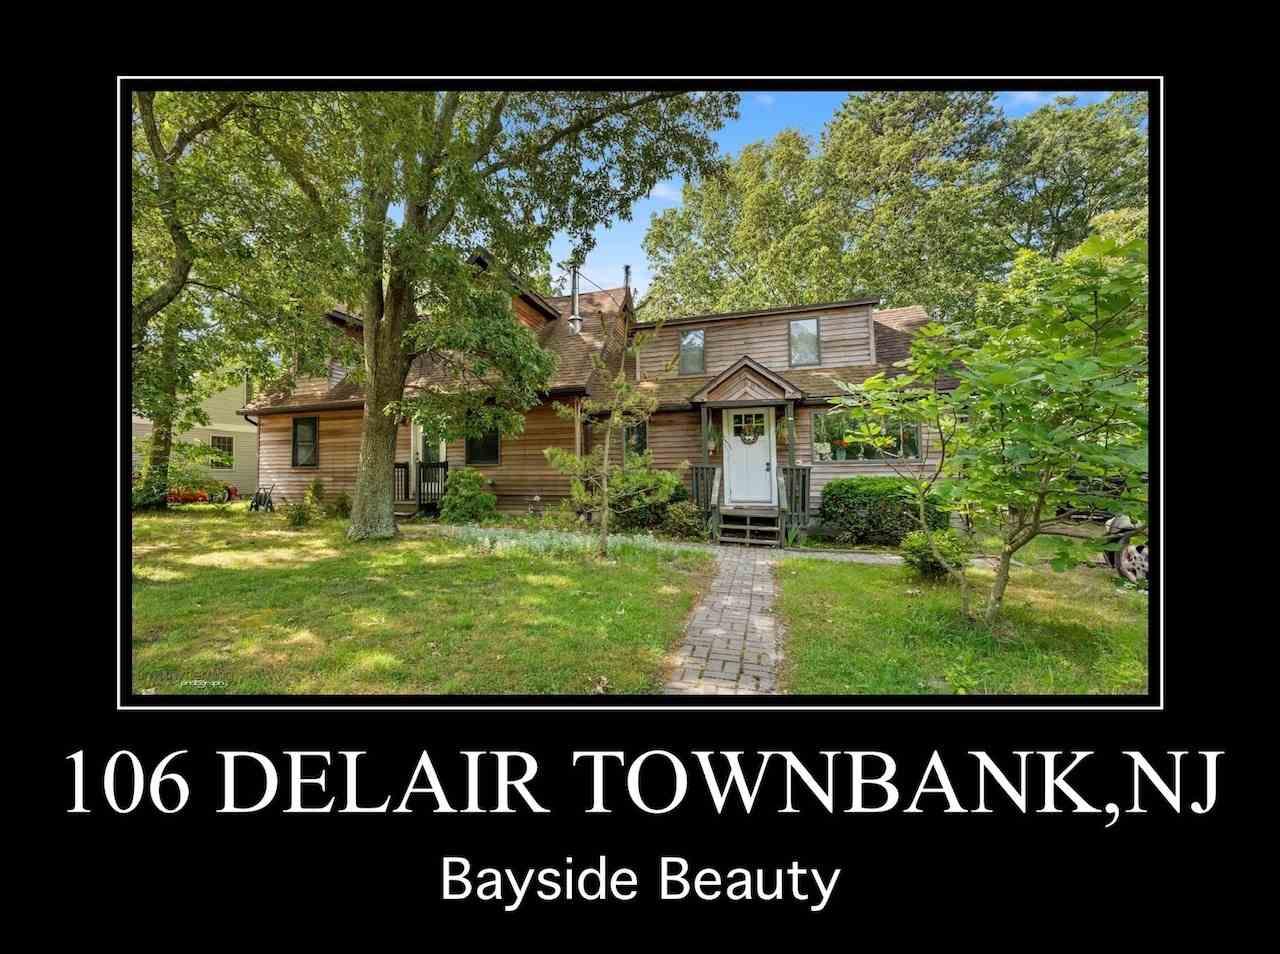 106 Delair, Townbank, NJ 08204